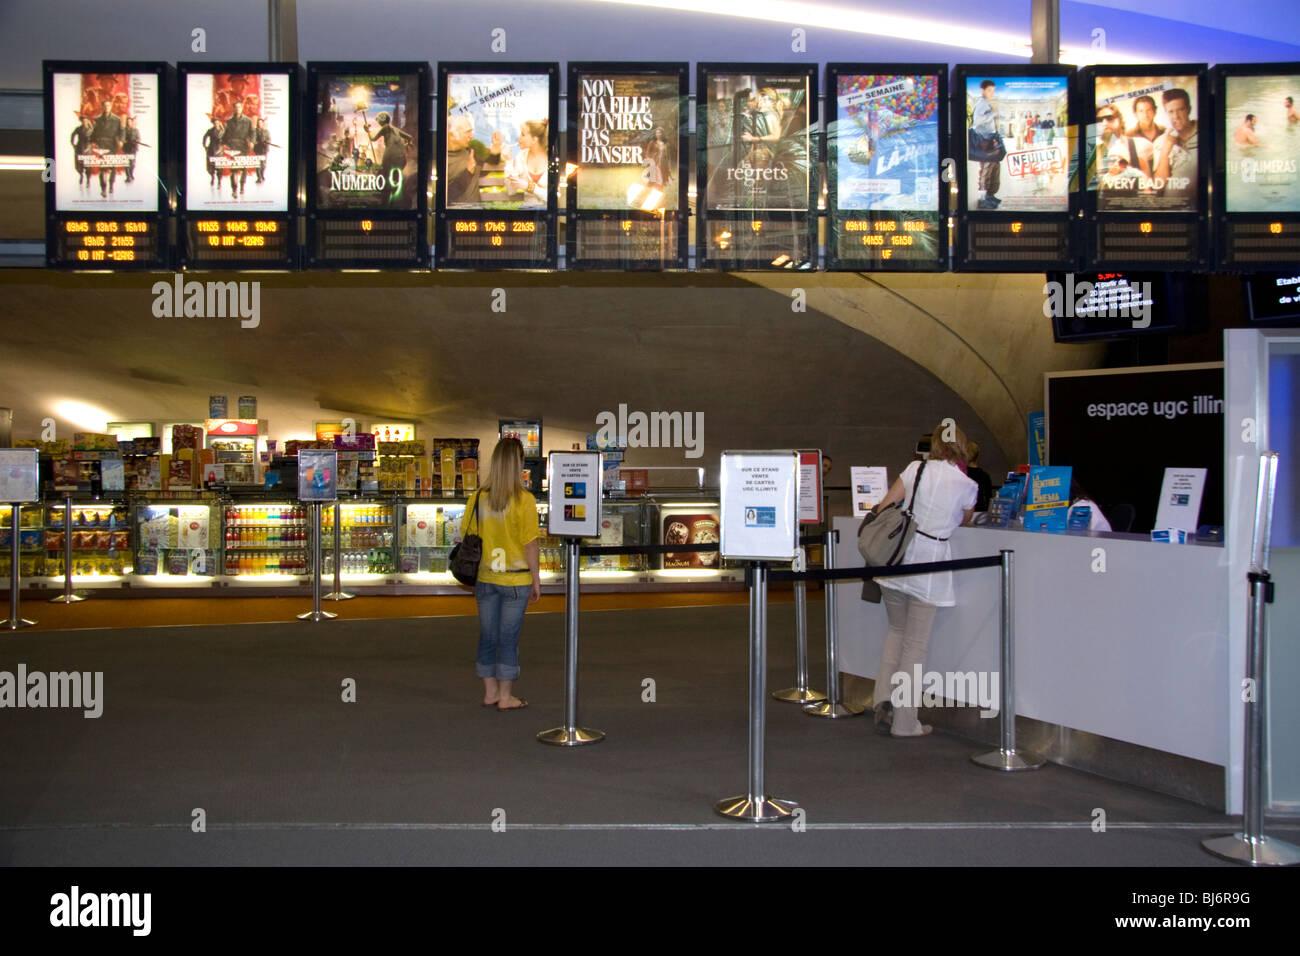 Cinema entrance in the Forum des Halles in Paris, France. - Stock Image